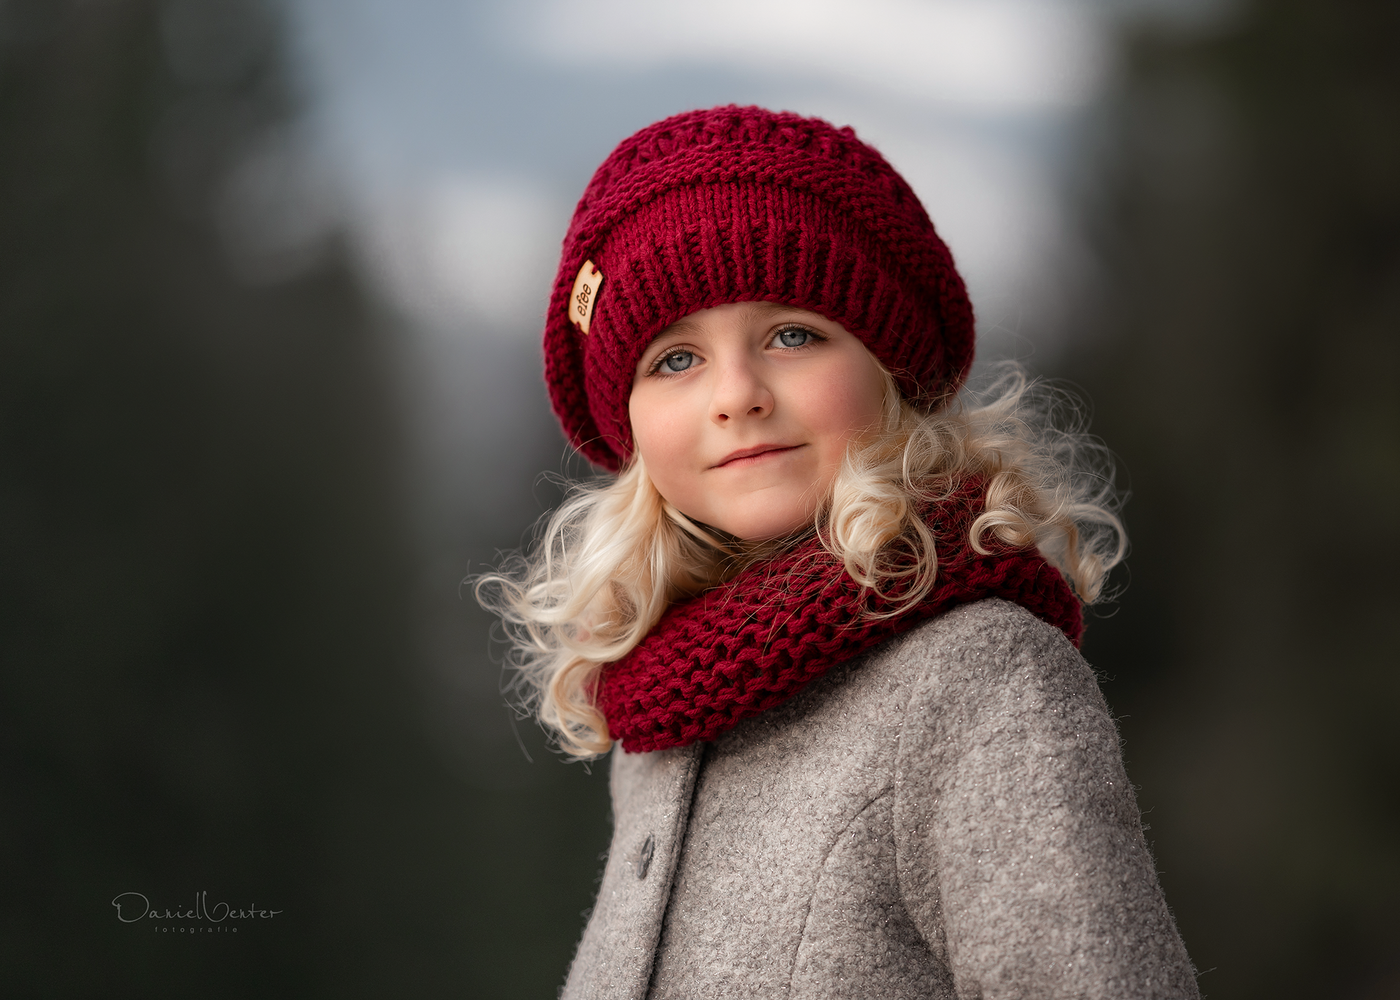 Winter Portrait by Daniel Venter